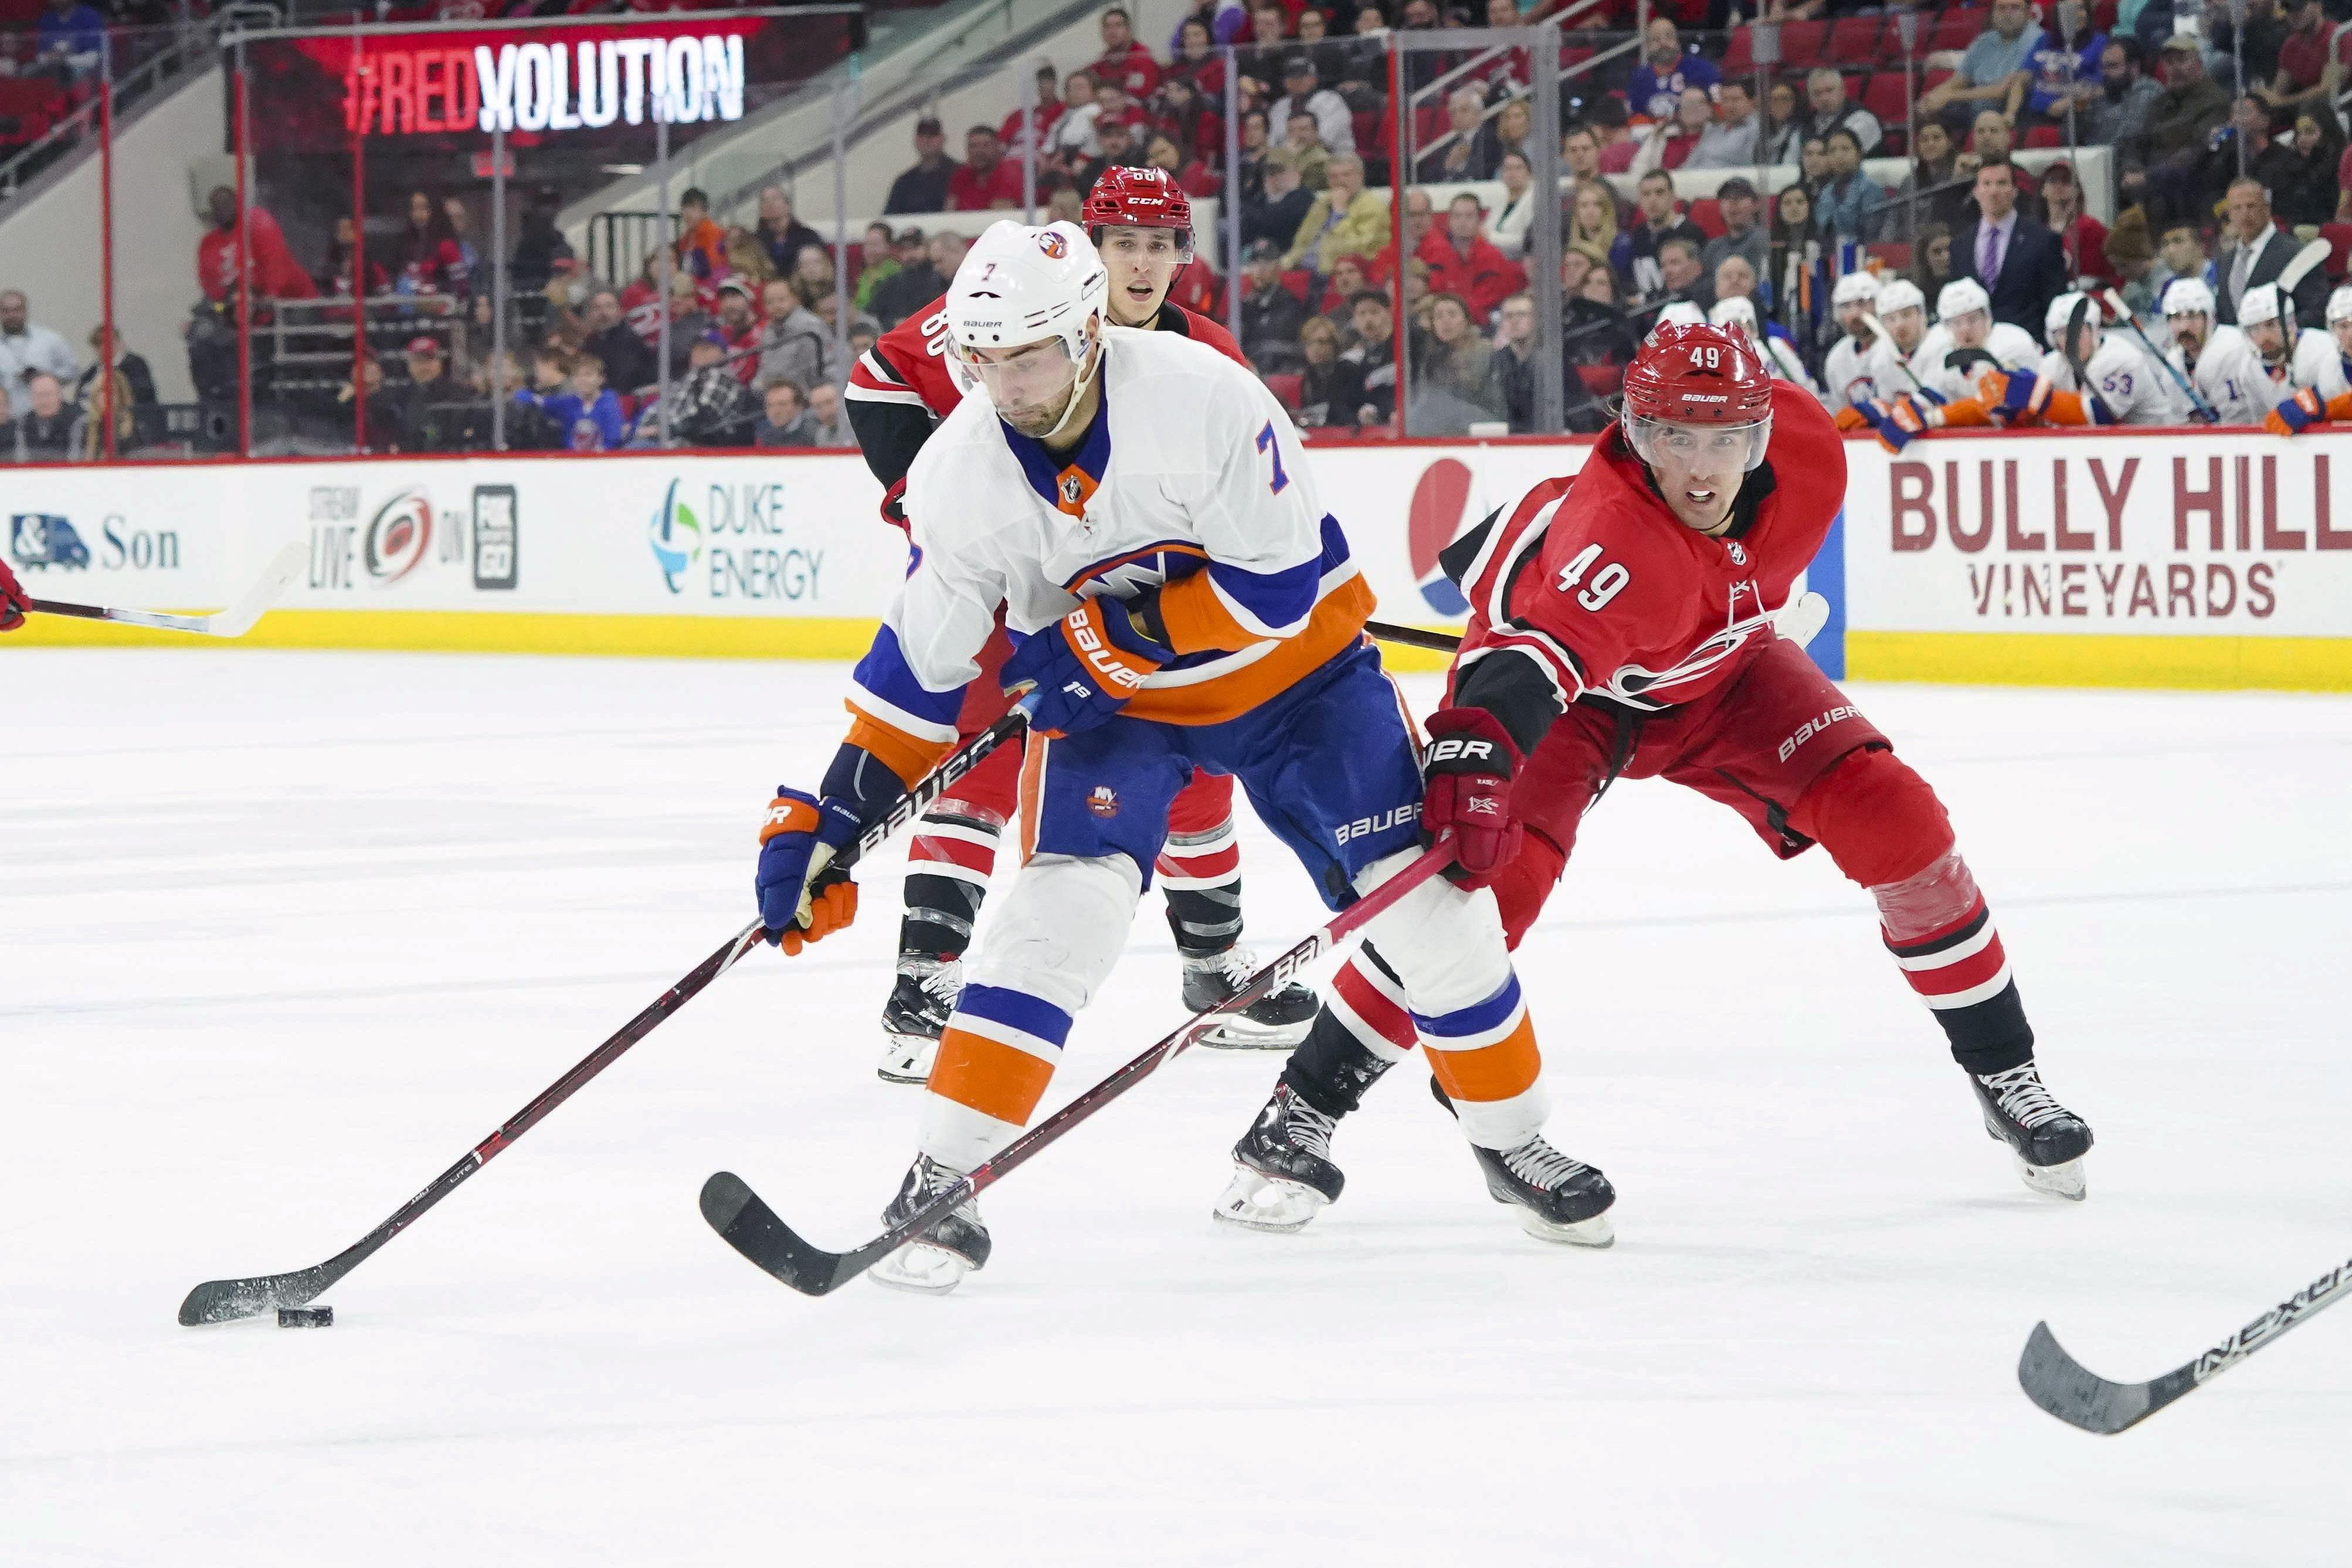 Isles pregame: Islanders open season in Carolina